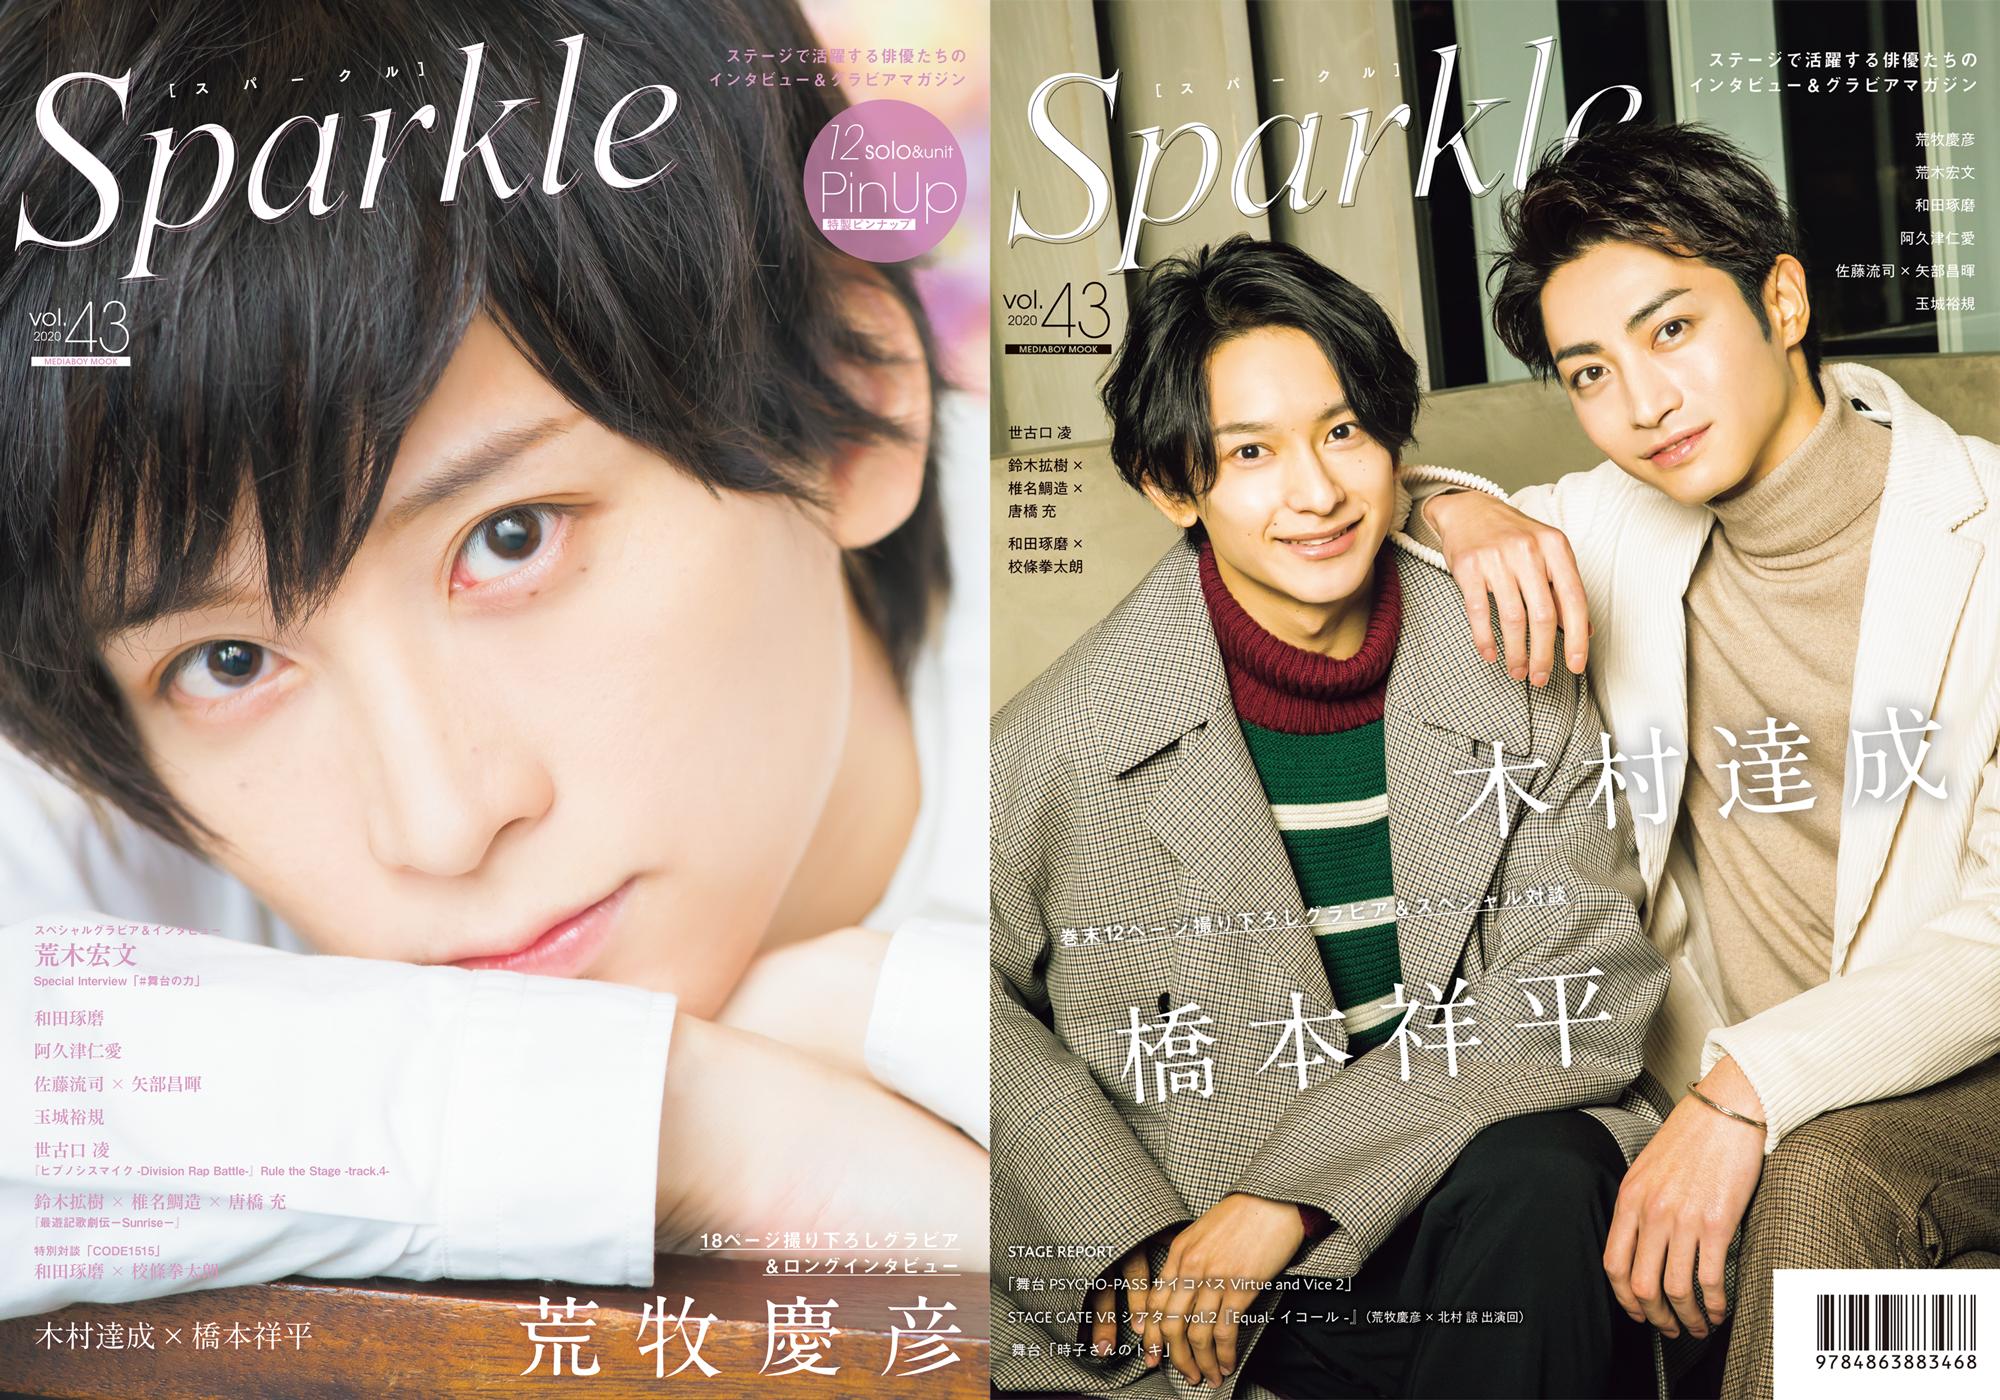 『Sparkle vol.43』表紙画像